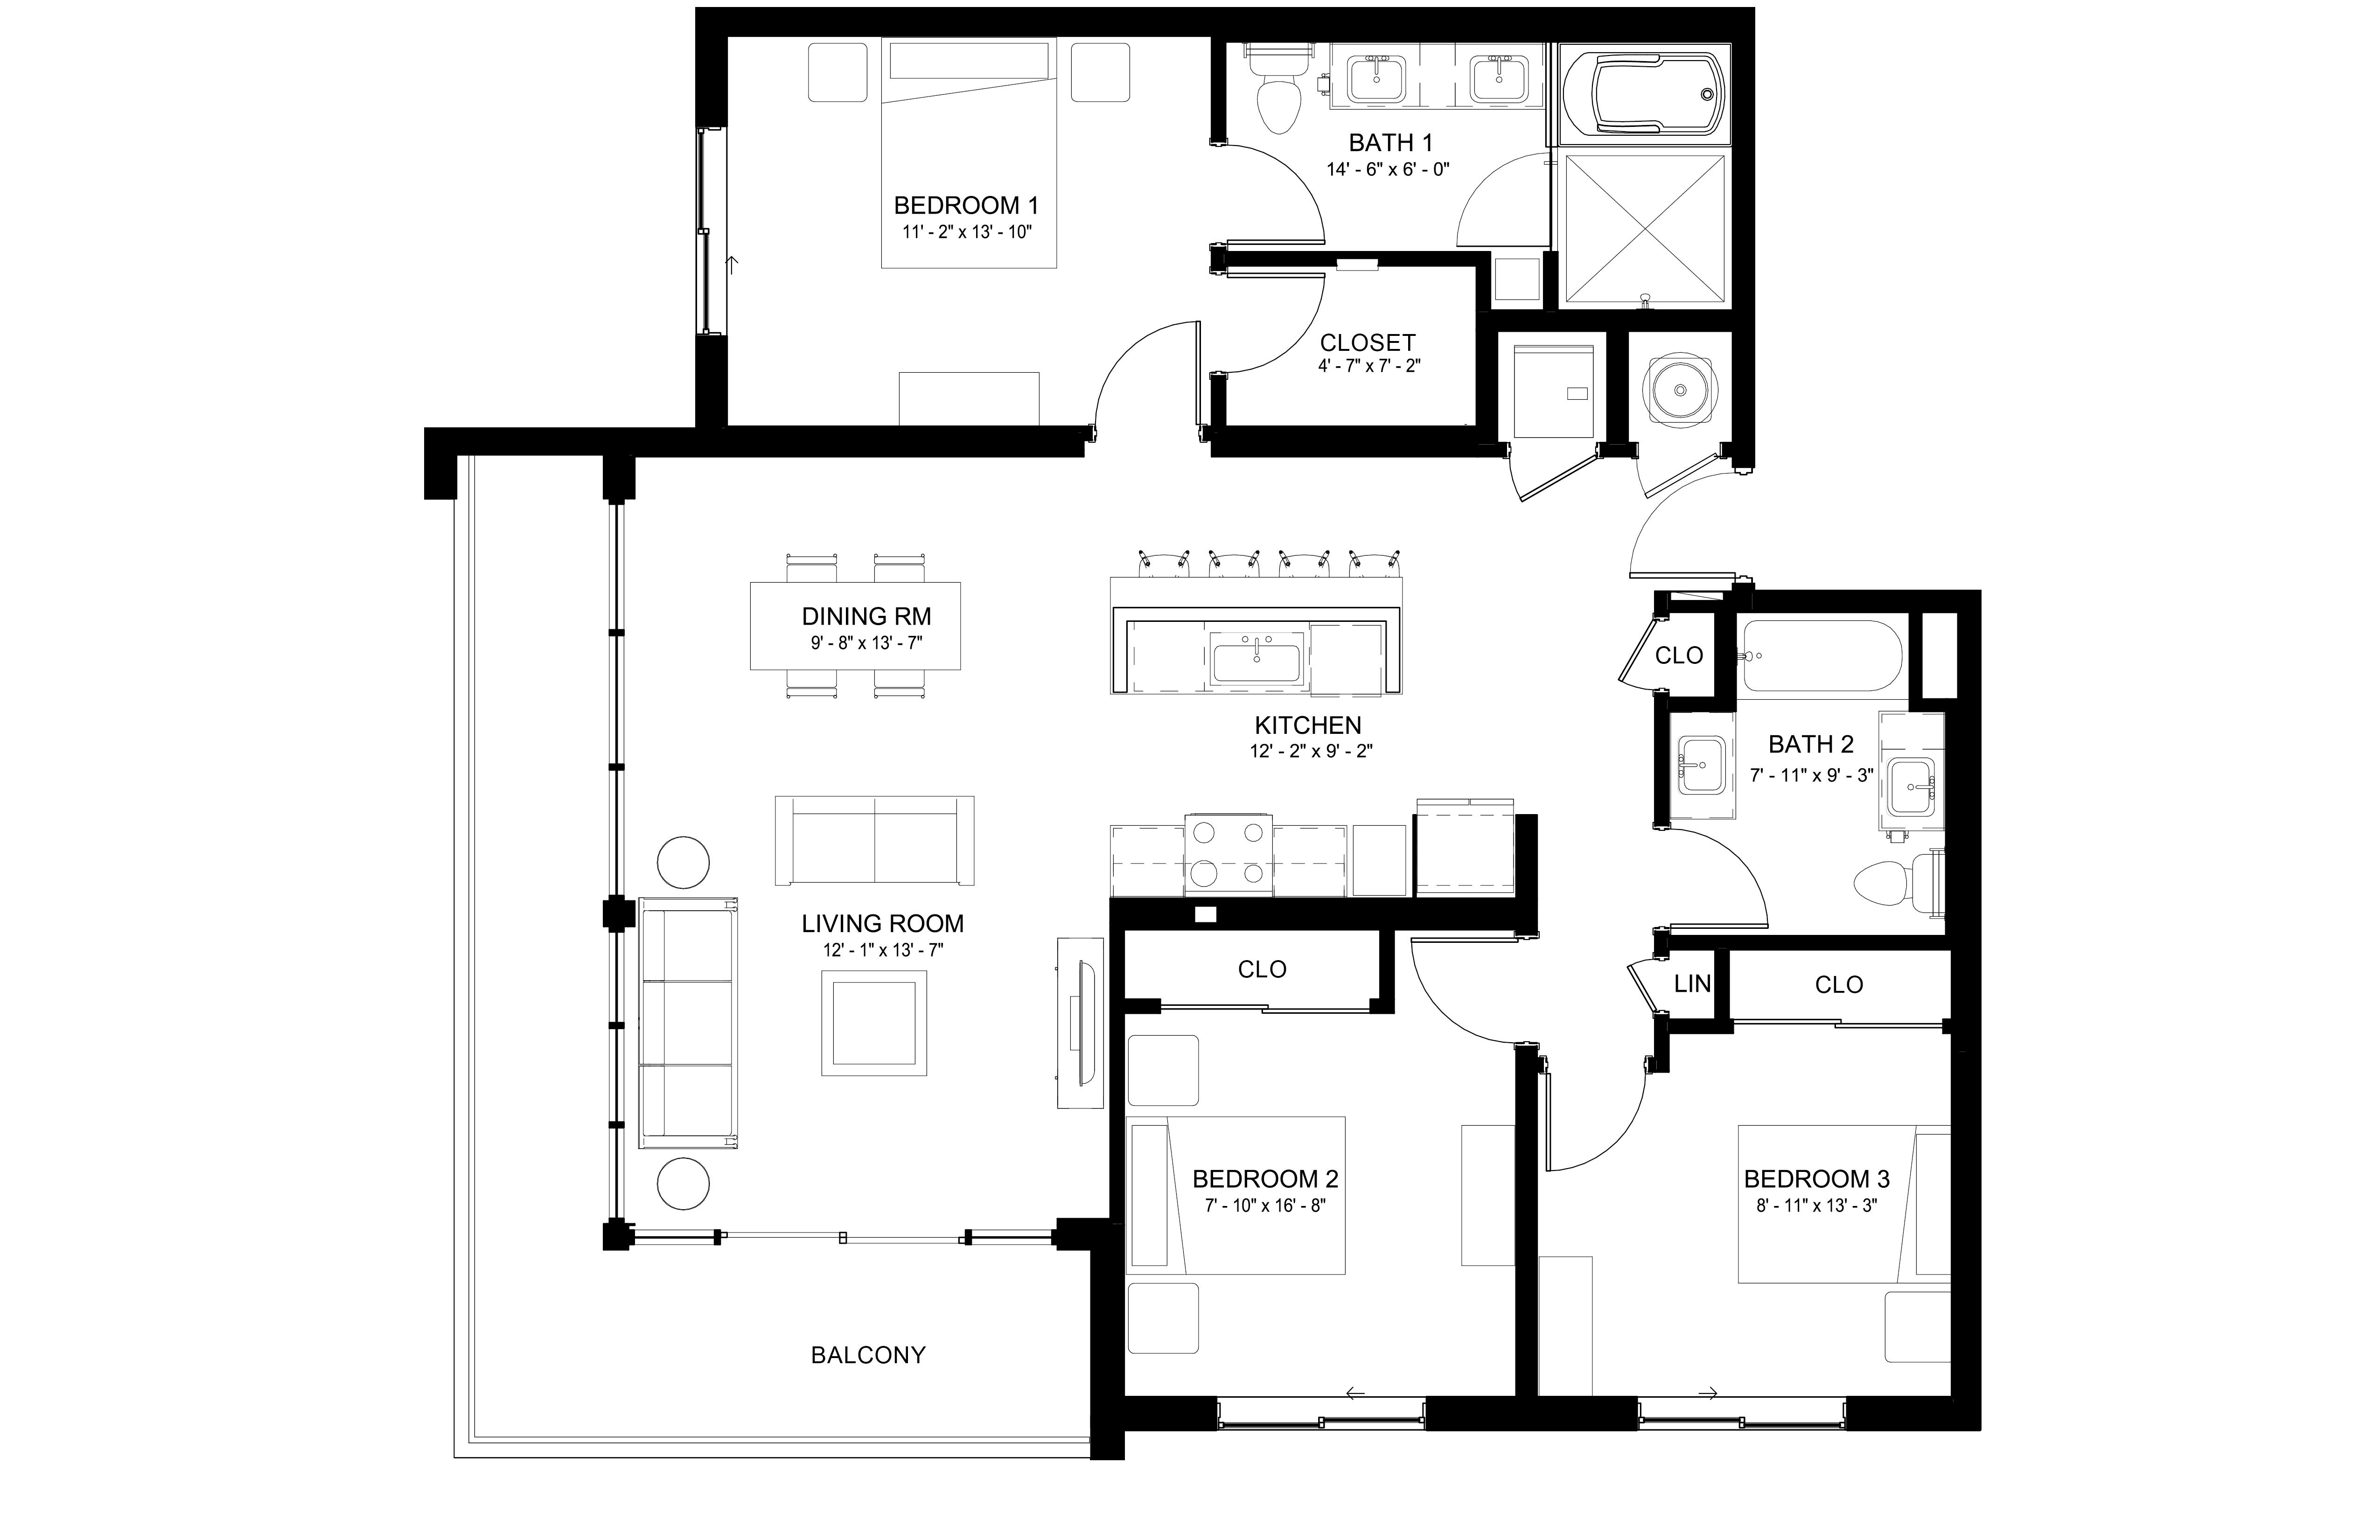 Apartment 642 floorplan